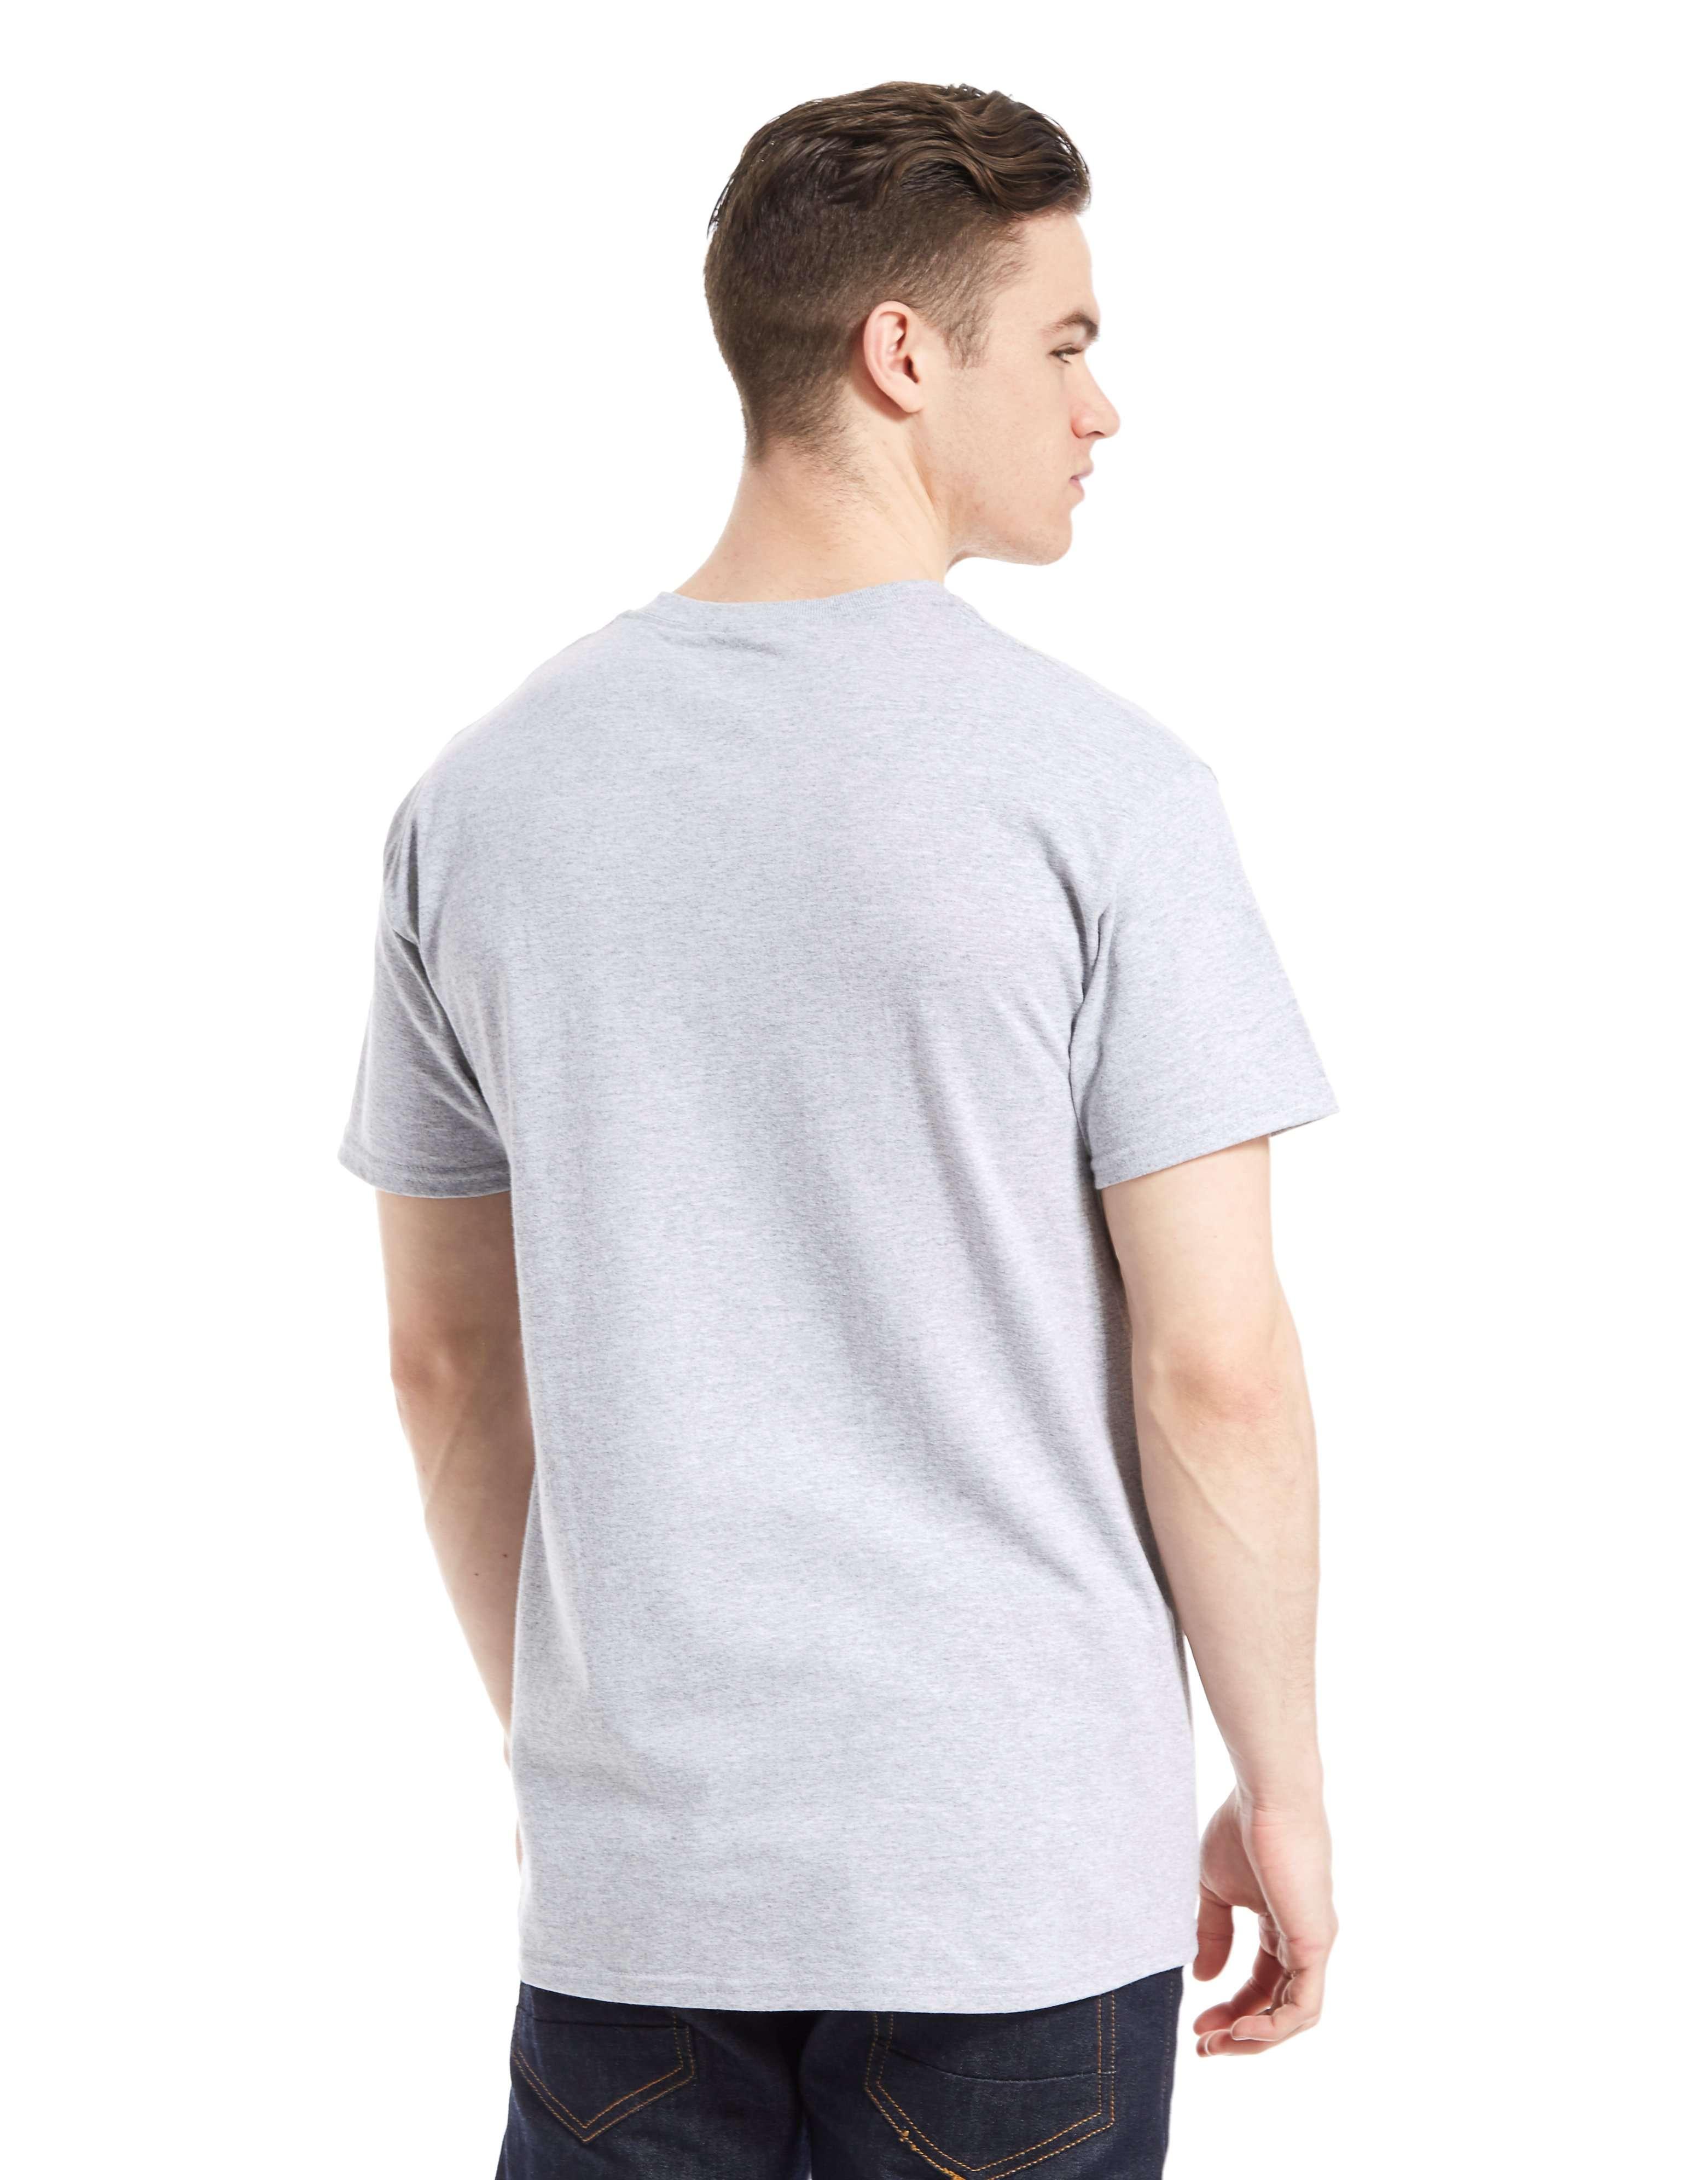 Official Team Chelsea F.C Blues T-Shirt